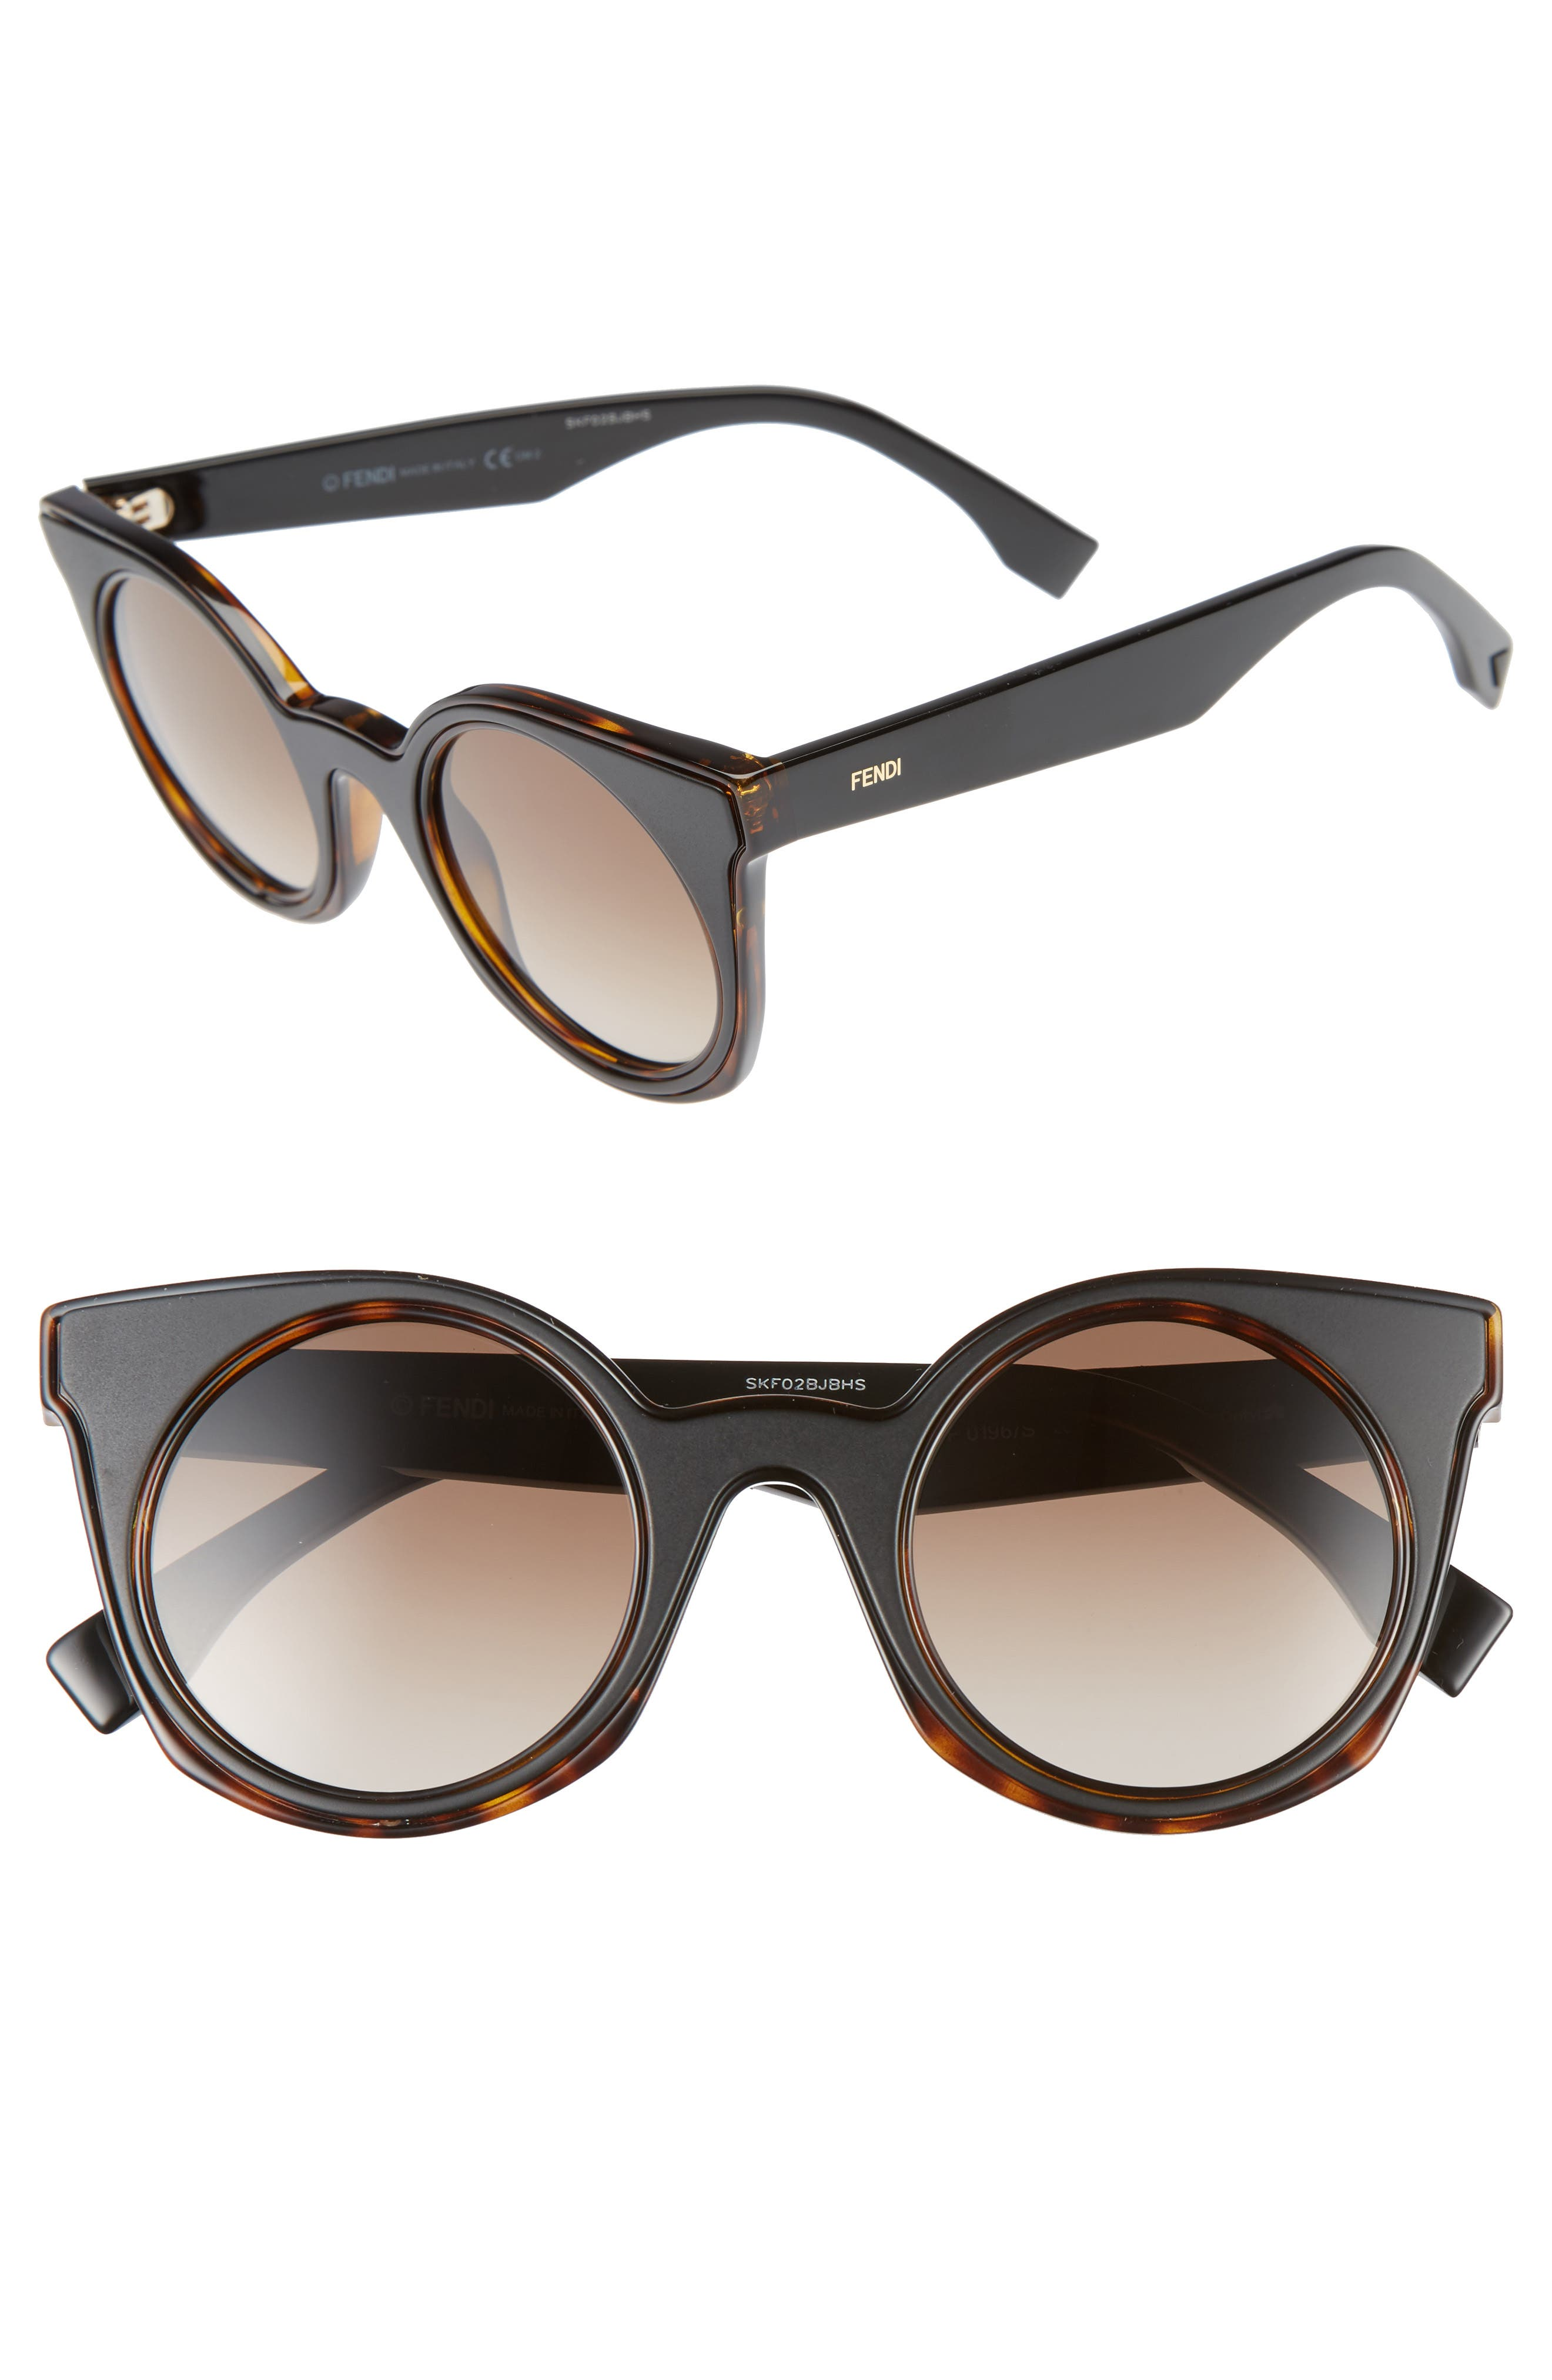 48mm Cat Eye Sunglasses,                             Alternate thumbnail 2, color,                             210